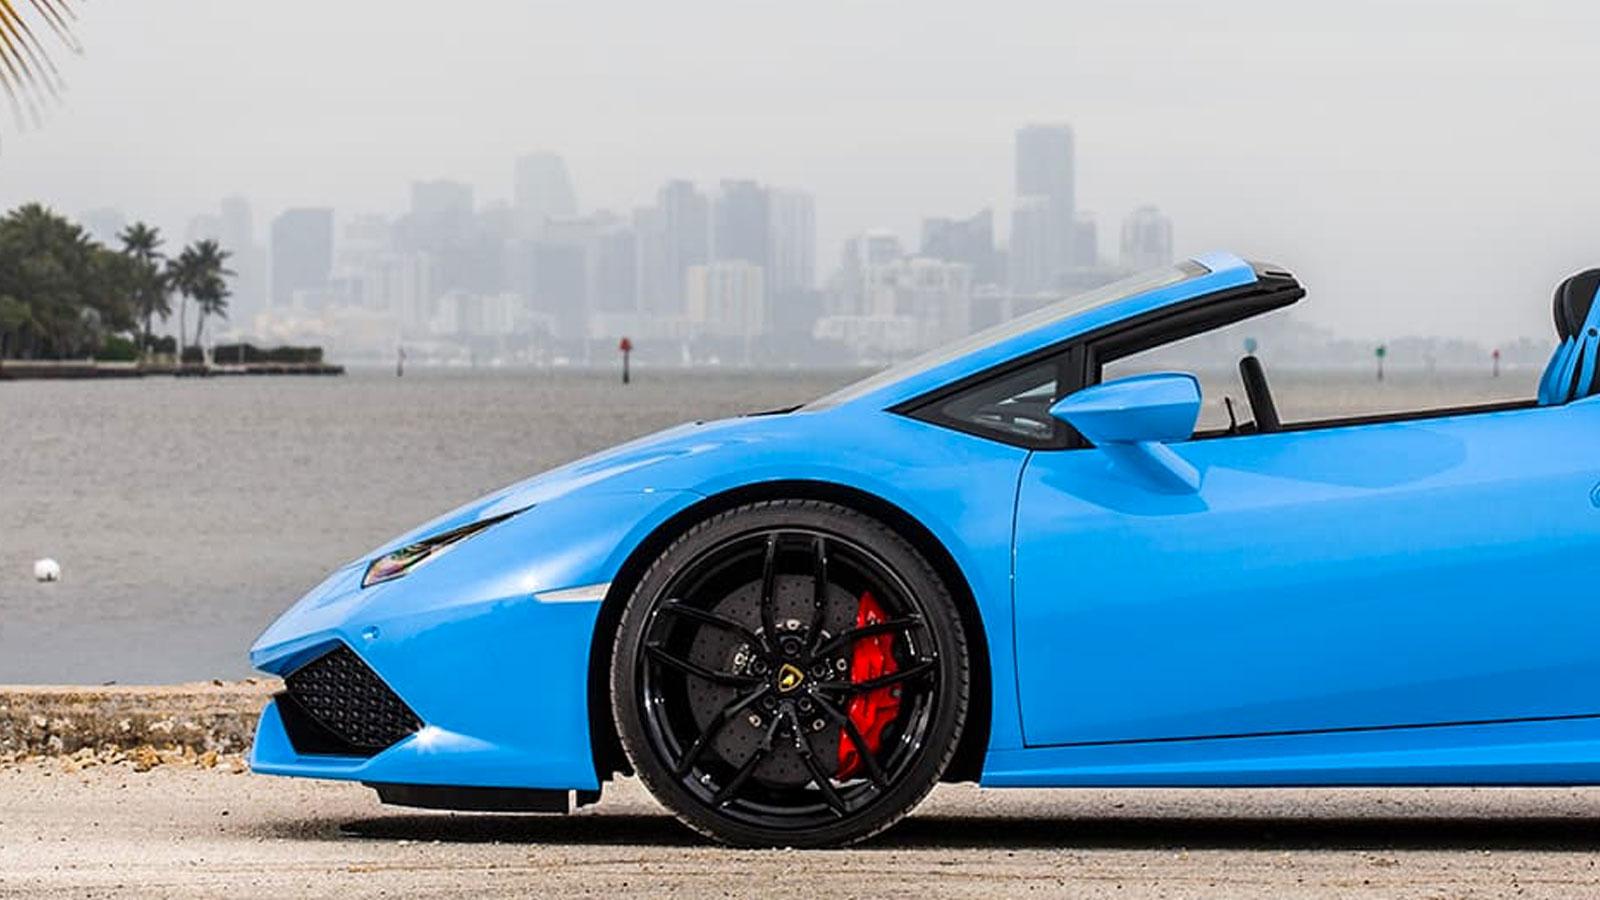 Lamborghini Huracan AWD Spyder - Inspiring Technology image 13